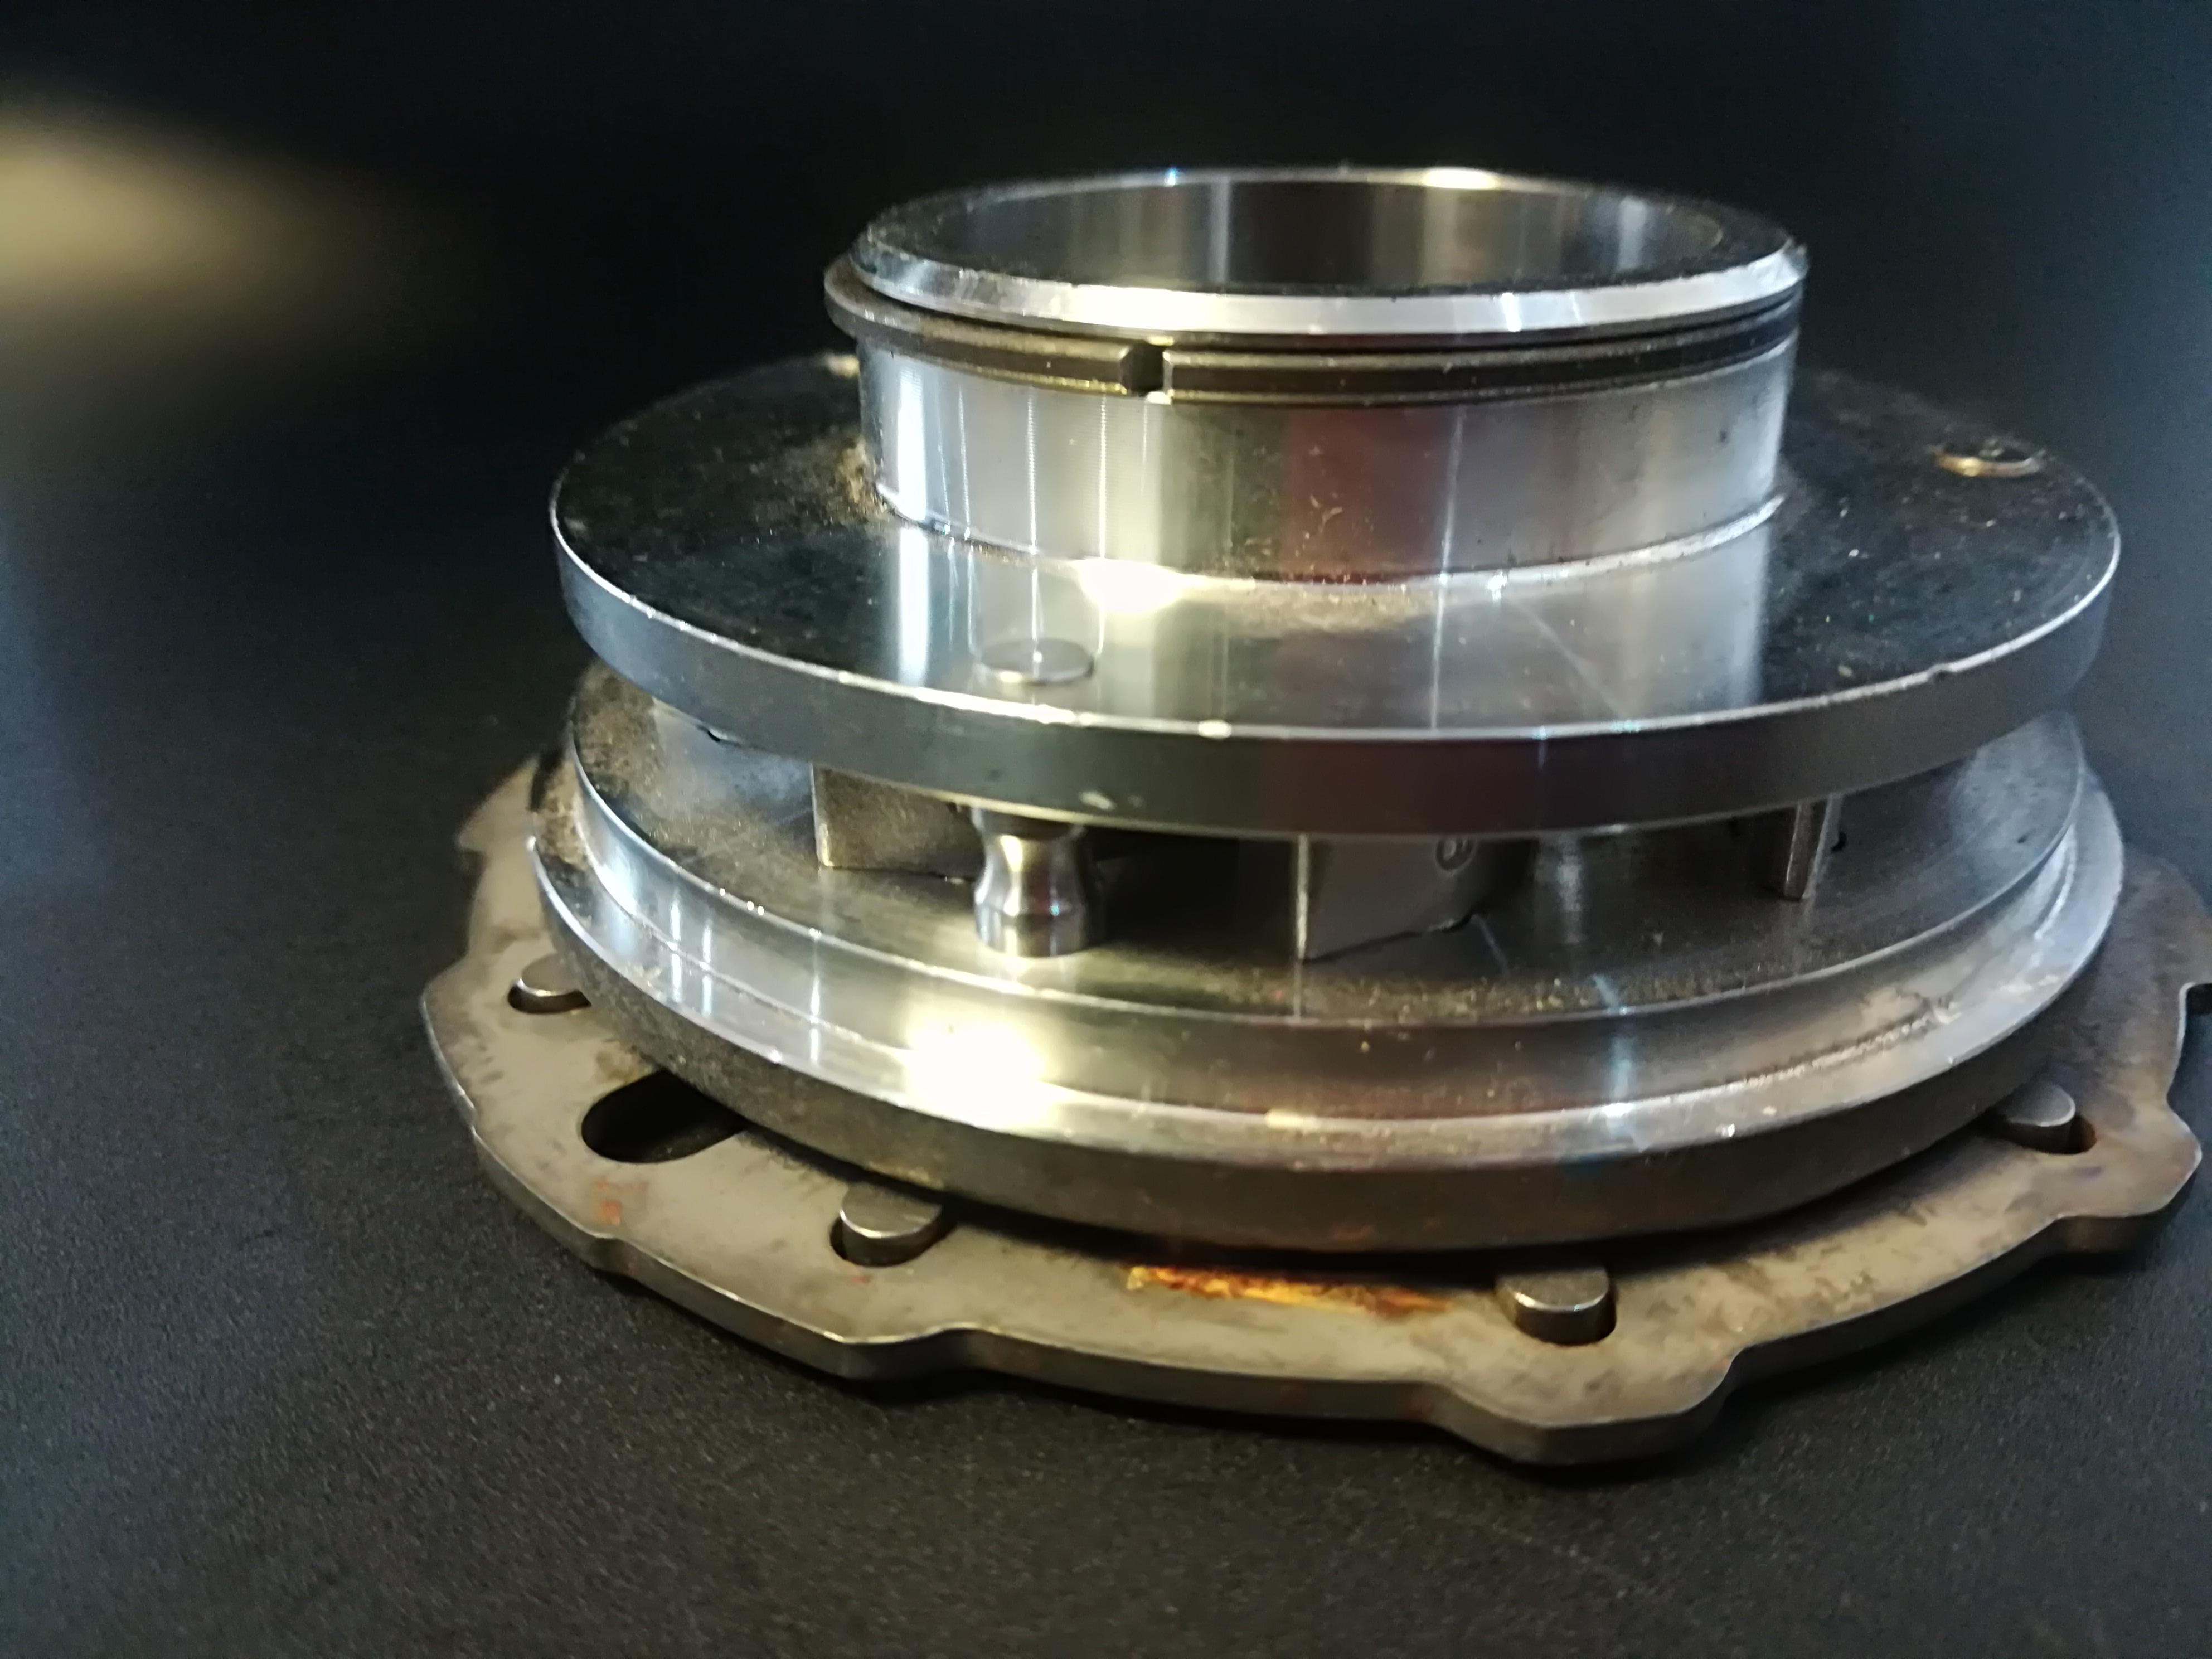 6813-18S turbo wastegate actuator   040416 B0246